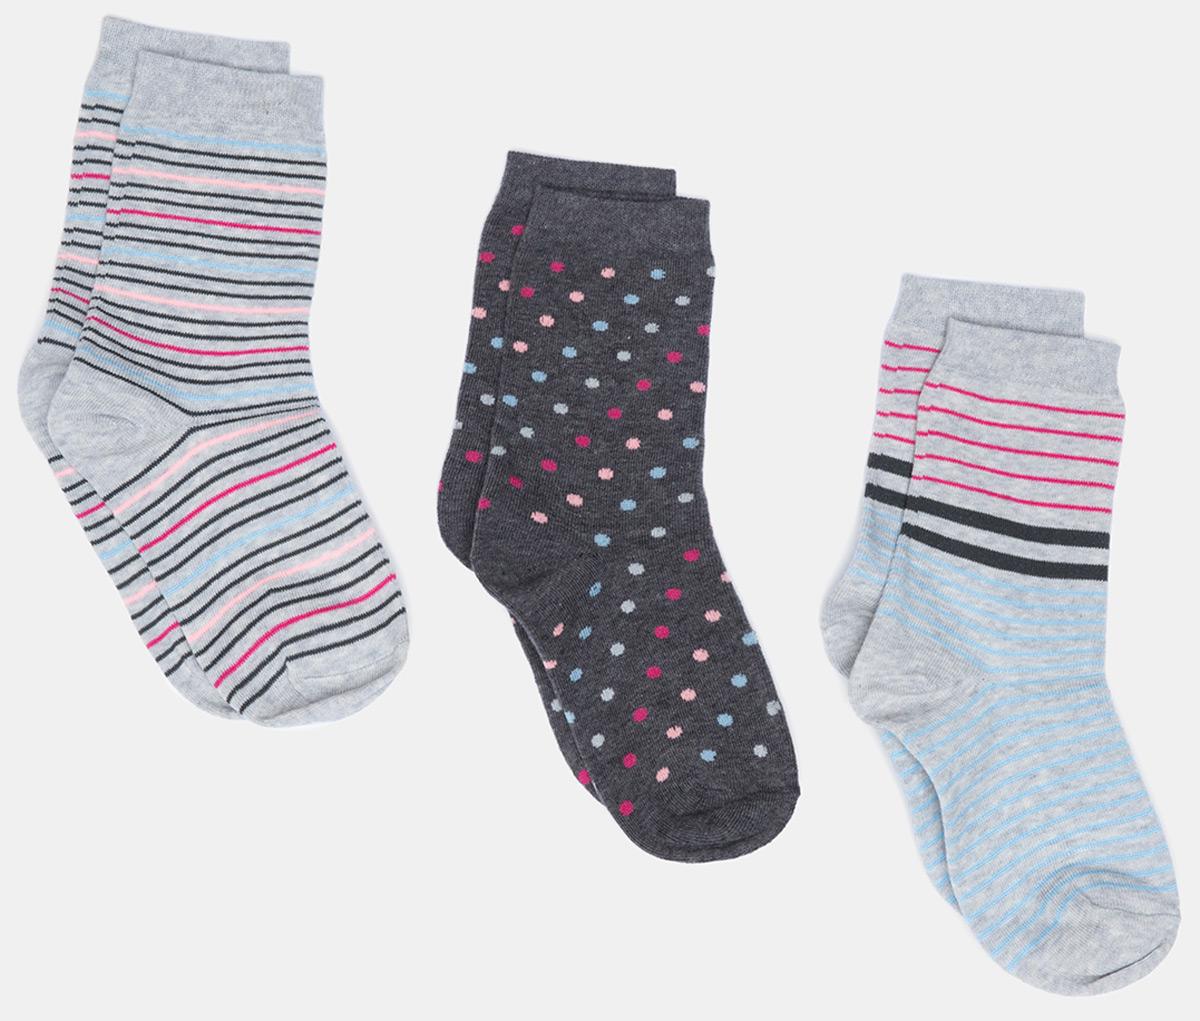 Носки женские Infinity Lingerie Trina, цвет: мультиколор, 3 пары. 31204420081_8000. Размер 39/40